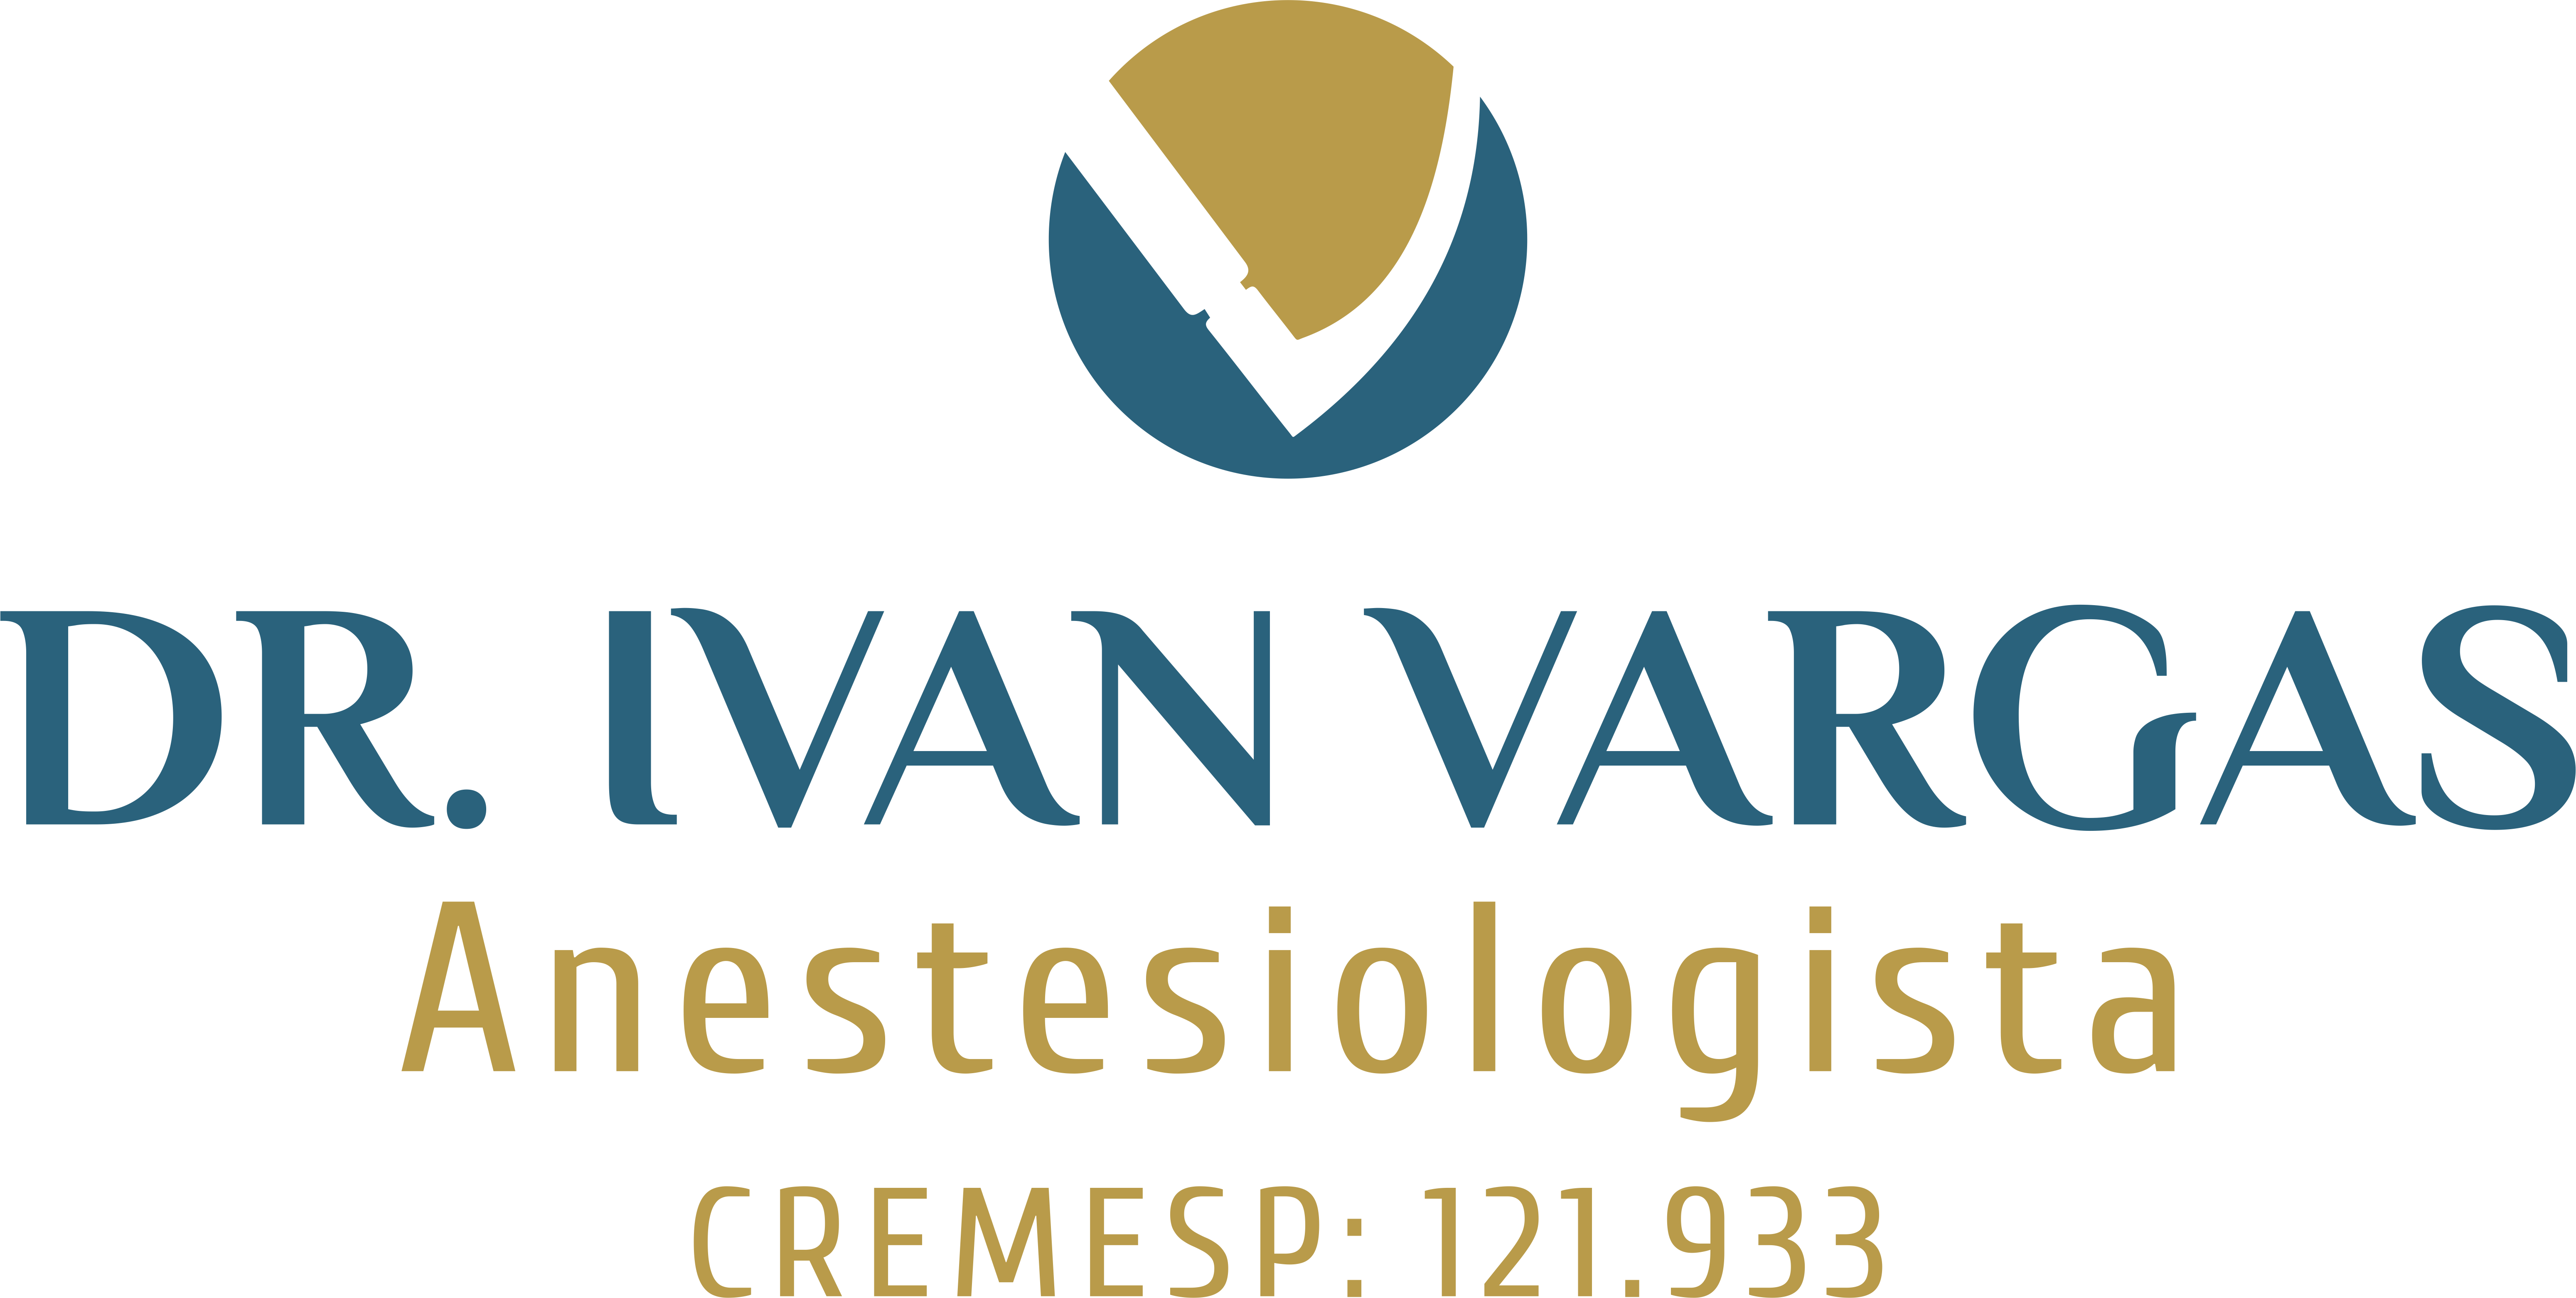 Dr. Ivan Vargas – CRM:121.933